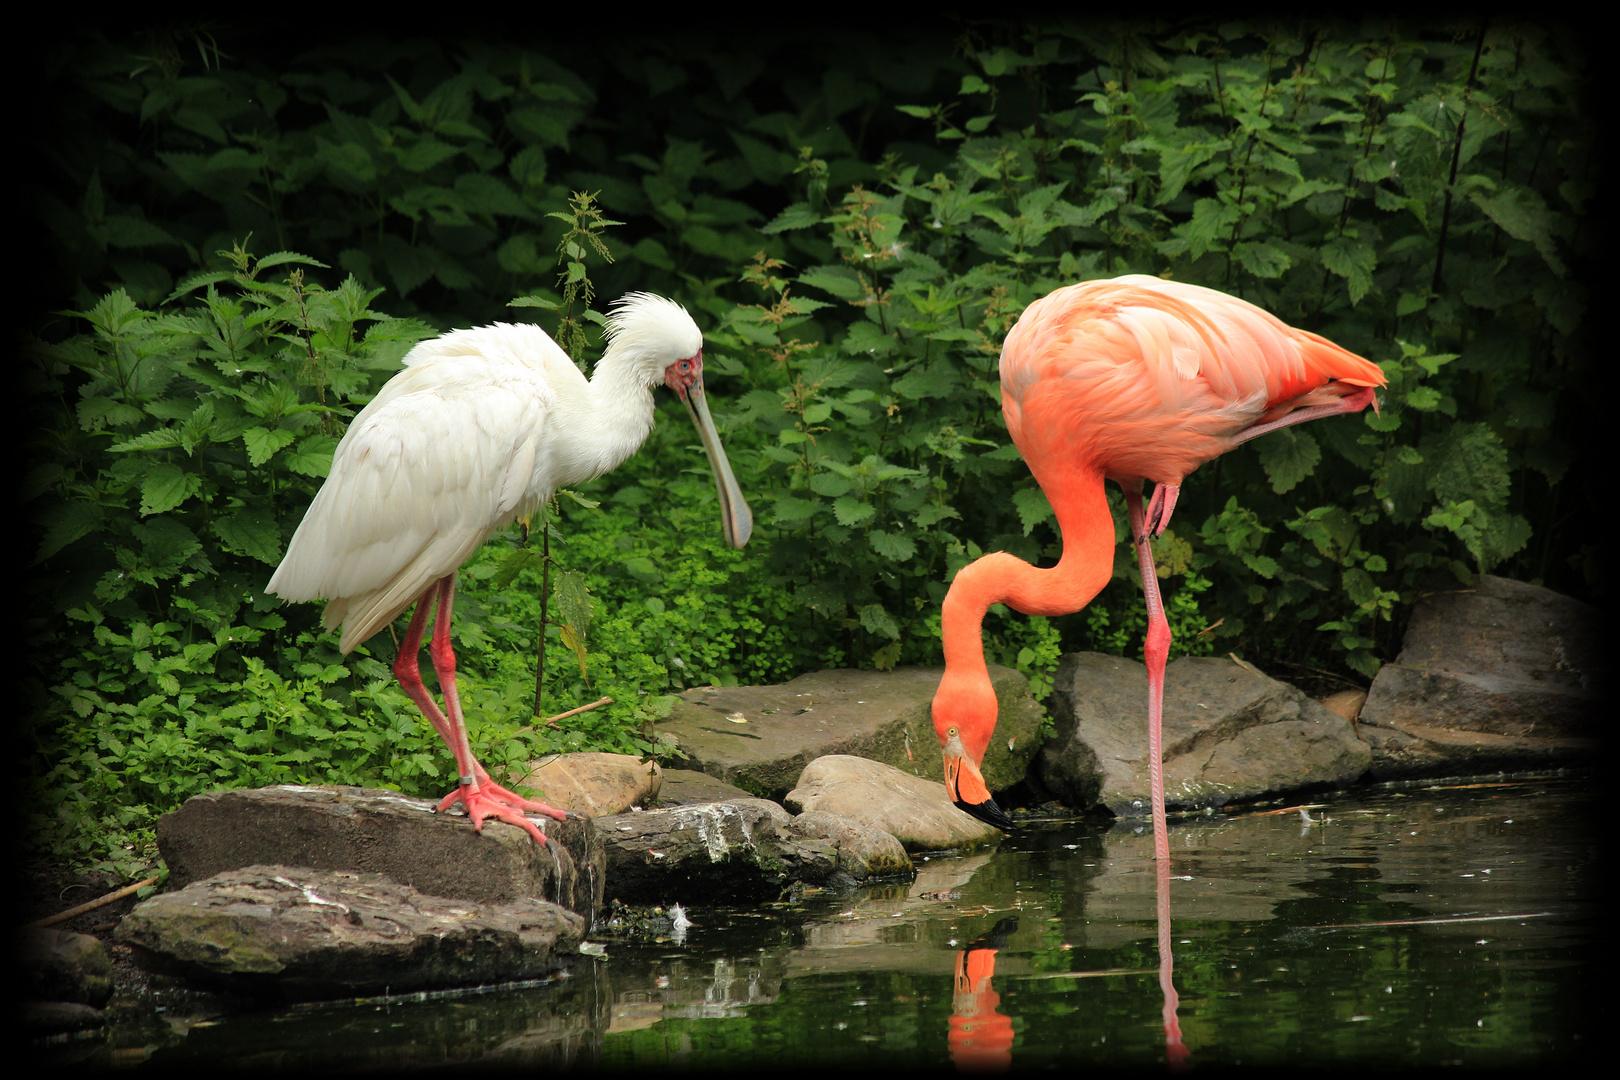 Flamingo & Löffelreiher im Freifluggehege in Essen/Grugapark